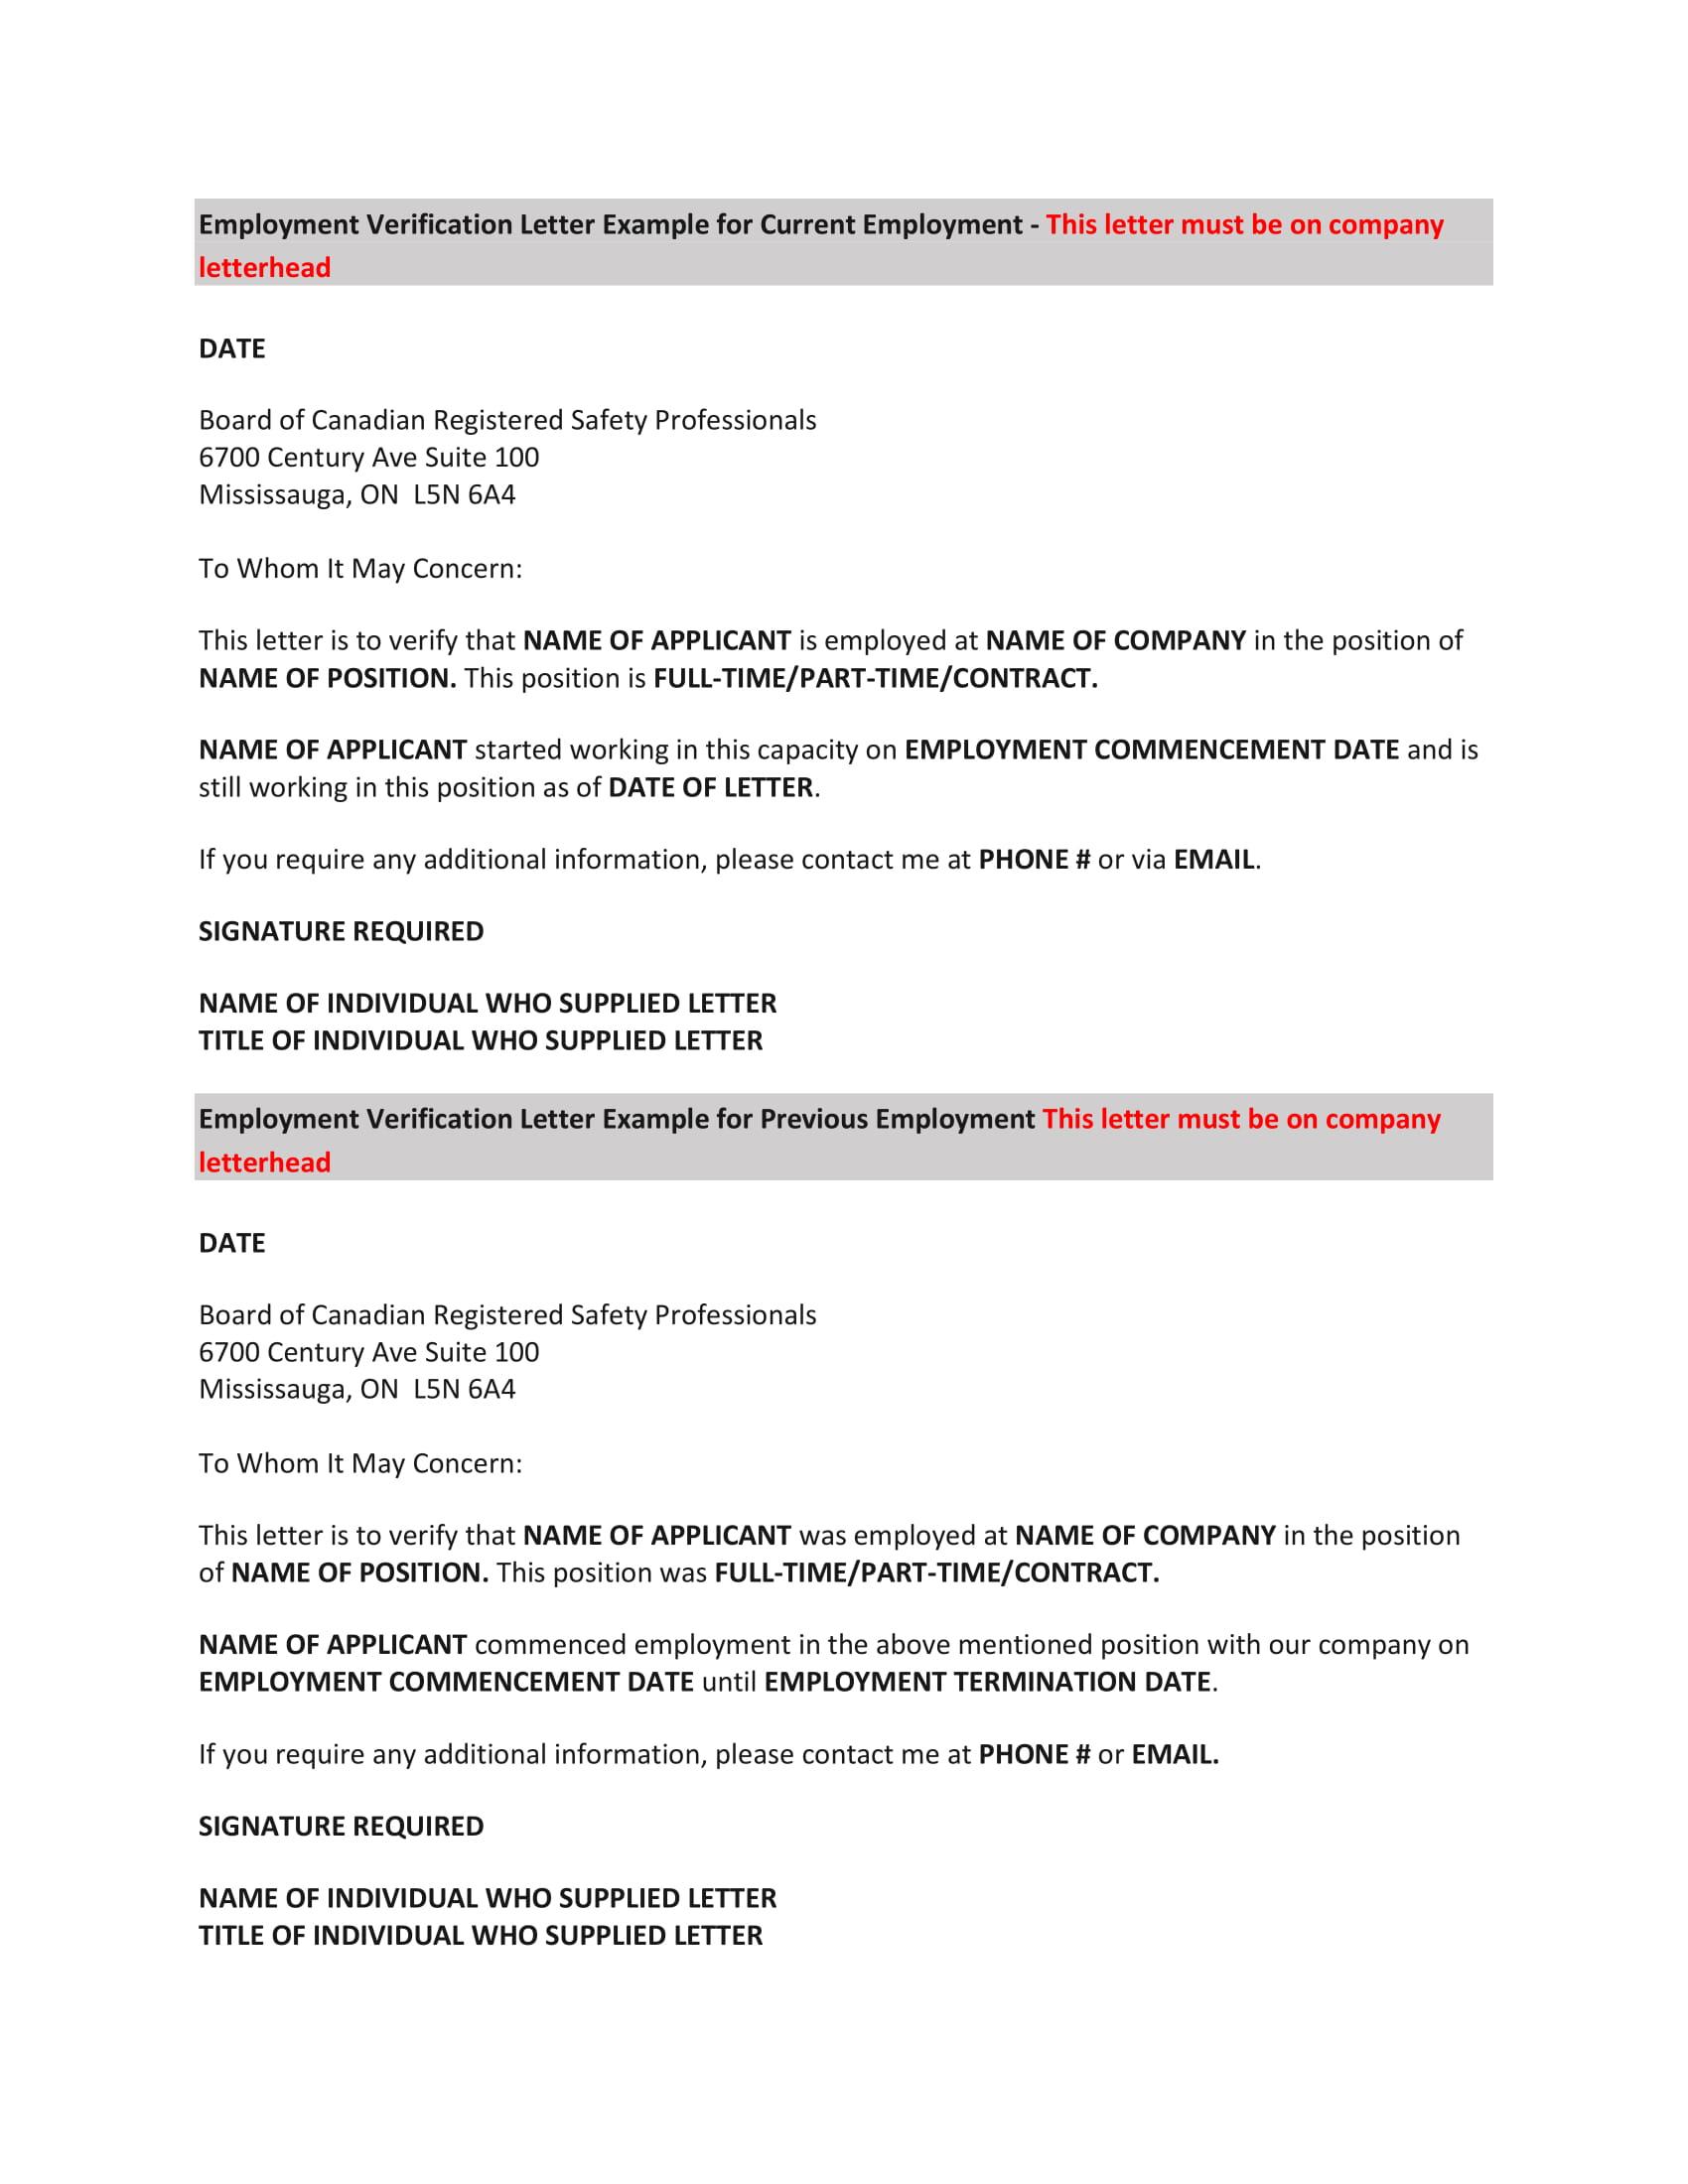 Restaurant-Employment-Verification-Letter-Template-1 Job Application Form For Restaurant on